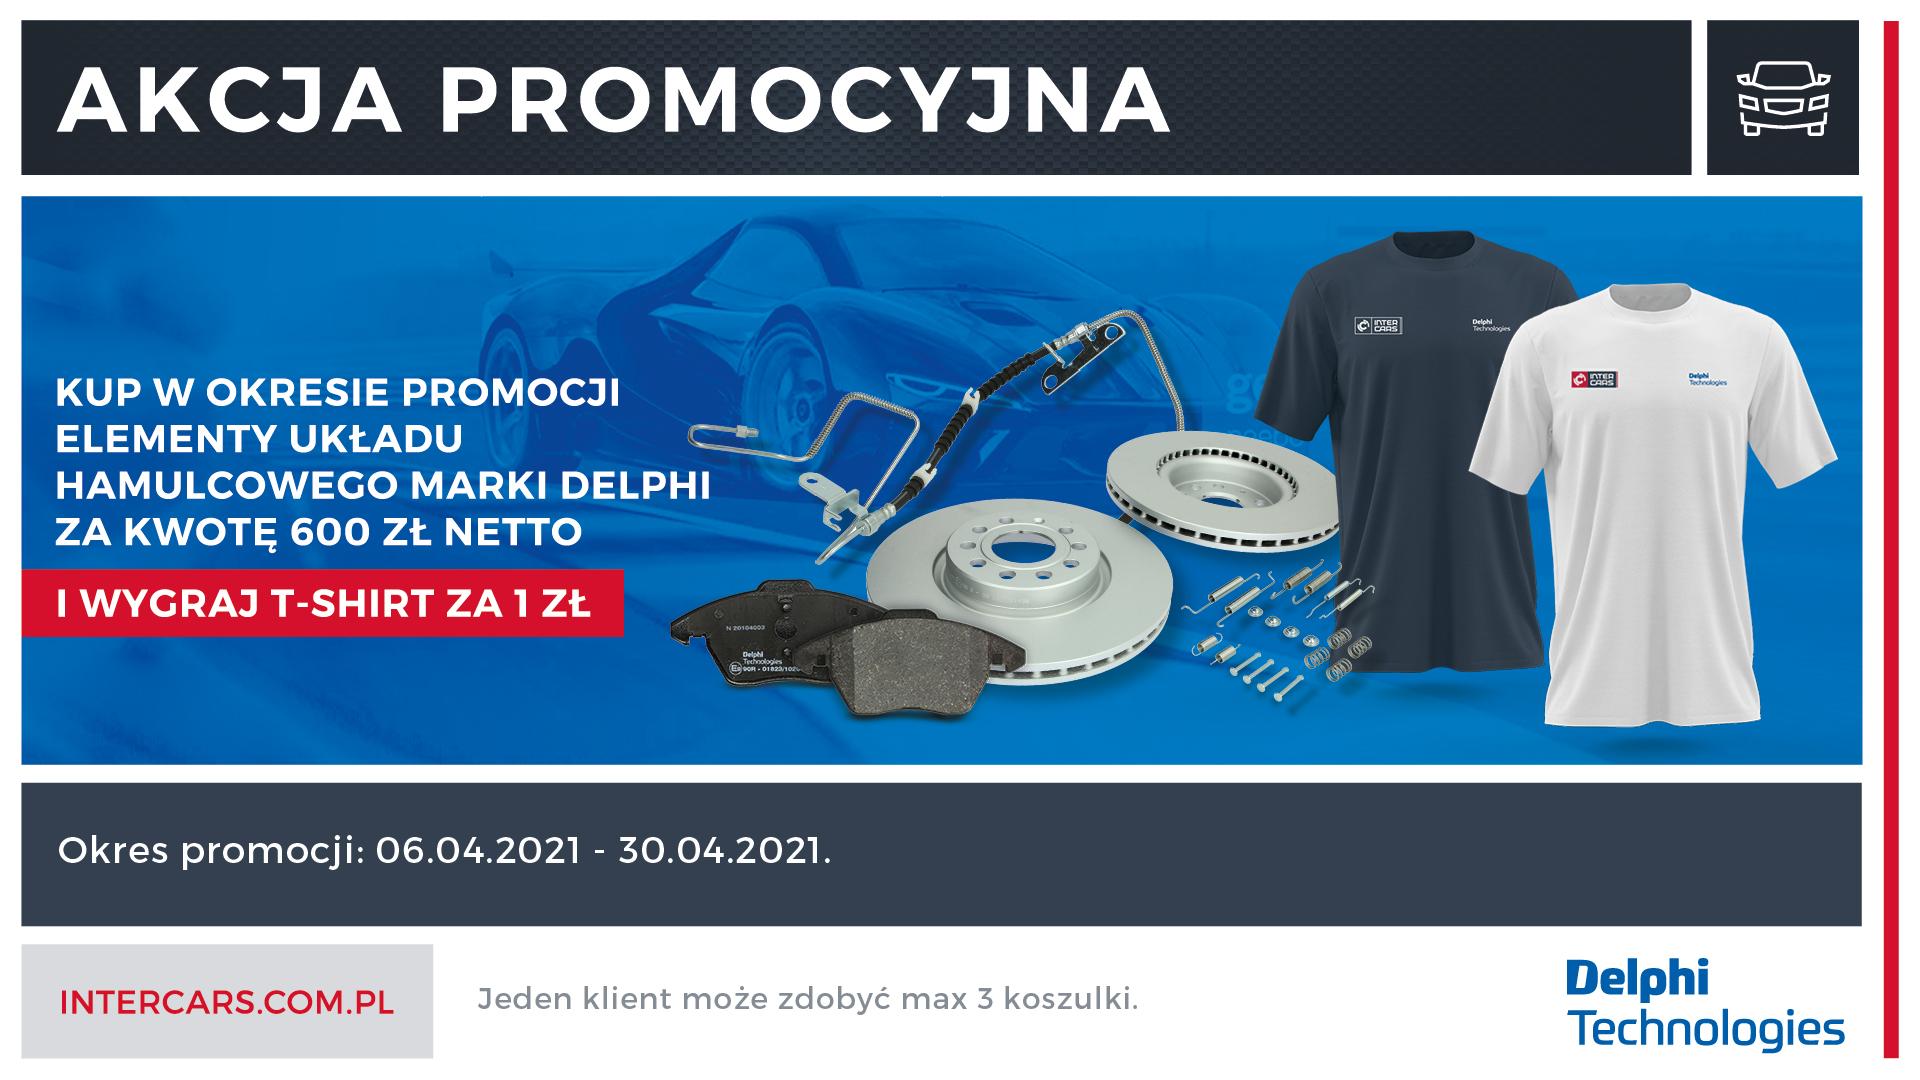 promocja_delphi_kup_uklad_hamulcowy_wygraj_tshirt_1920x1080_katalog.jpg